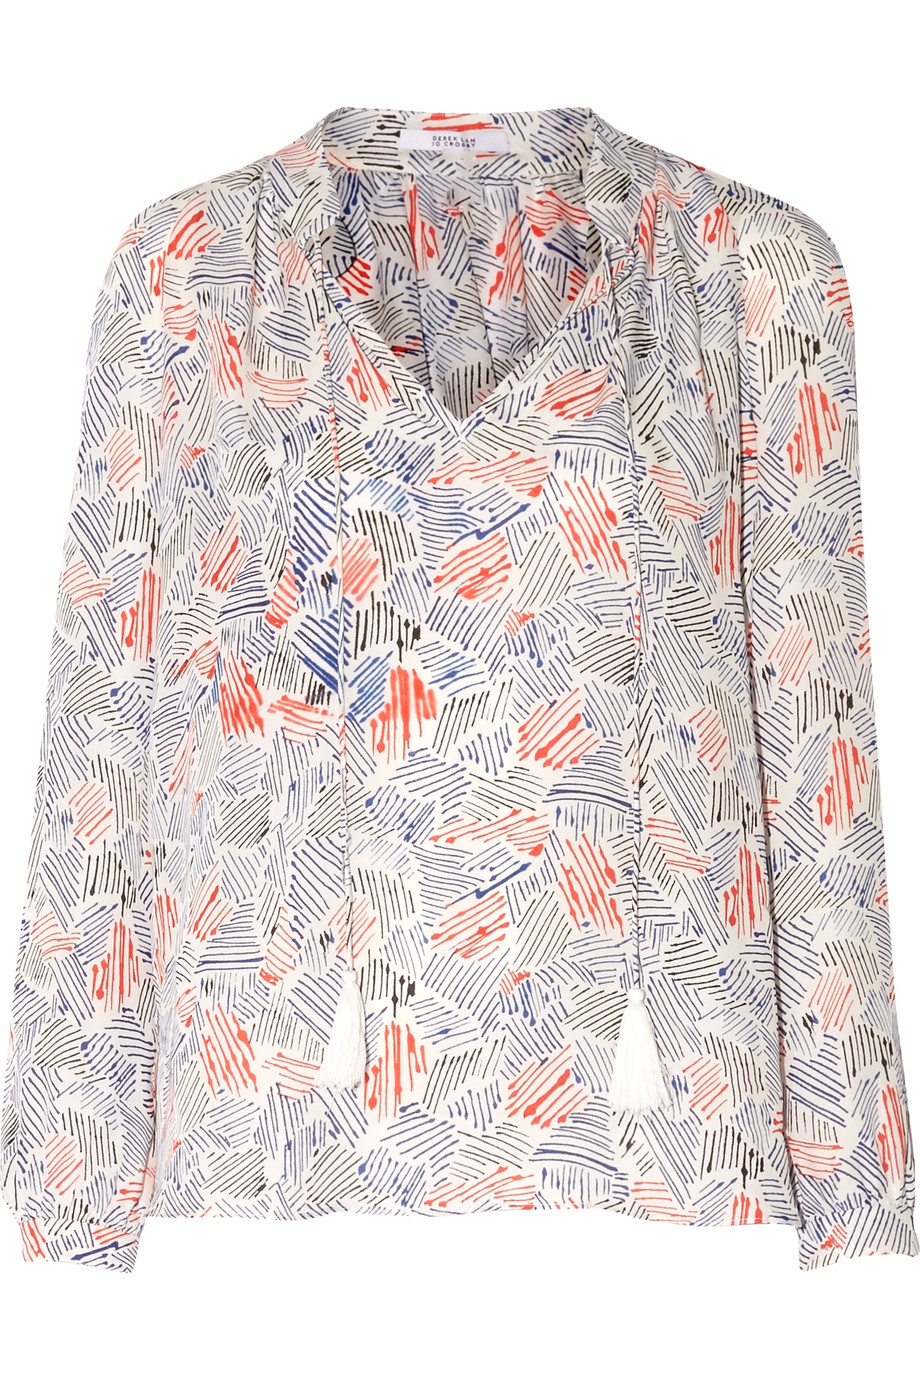 https-::www.theoutnet.com:en-US:Shop:Product:Derek-Lam-10-Crosby:Printed-silk-crepe-de-chine-blouse:989450?cm_sp=WIW_-_TO[989450]_-_FROM[989414].jpg